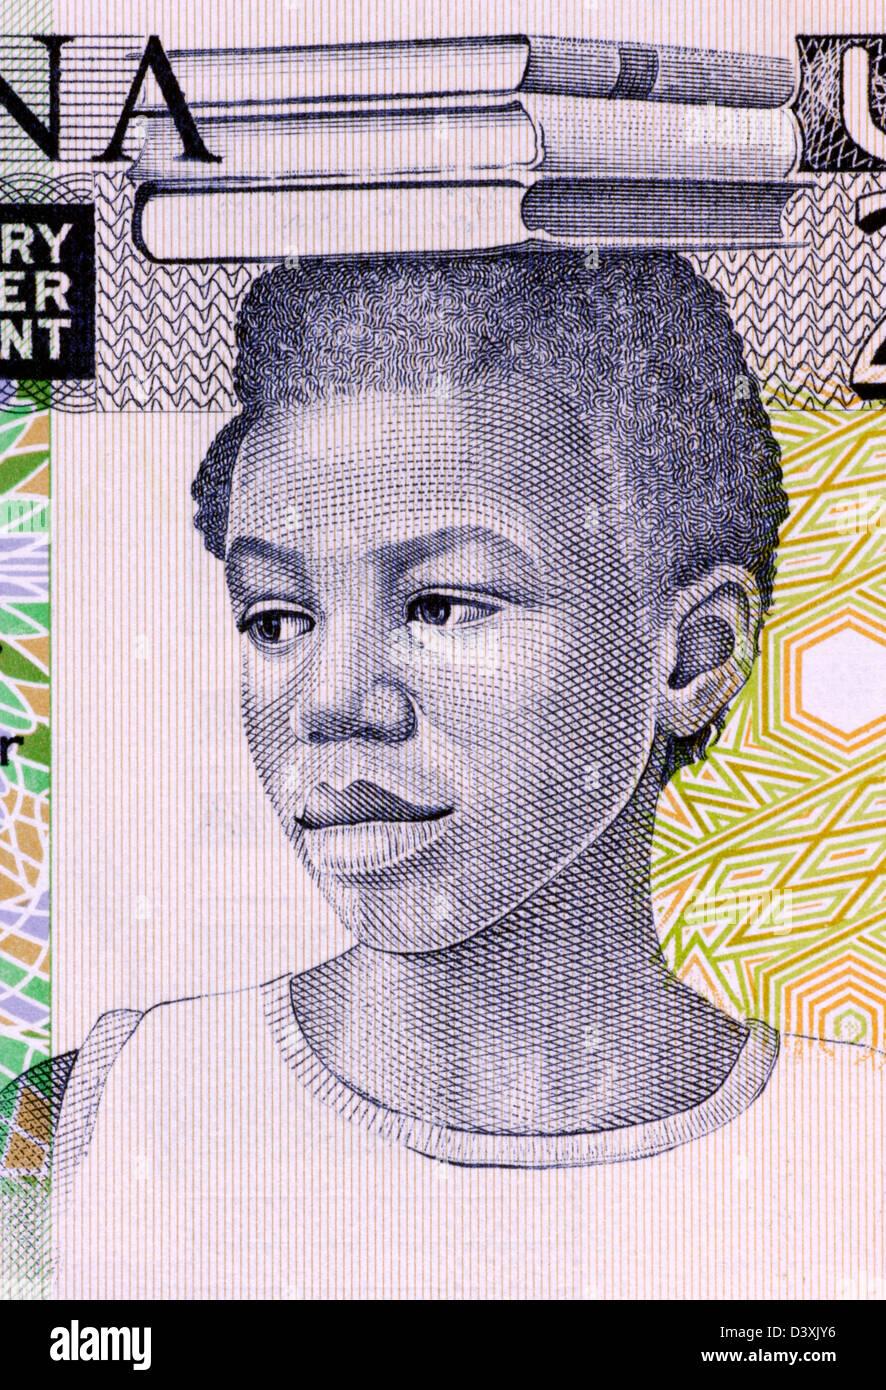 School Girl on 2 Cedis 1979 Banknote from Ghana - Stock Image